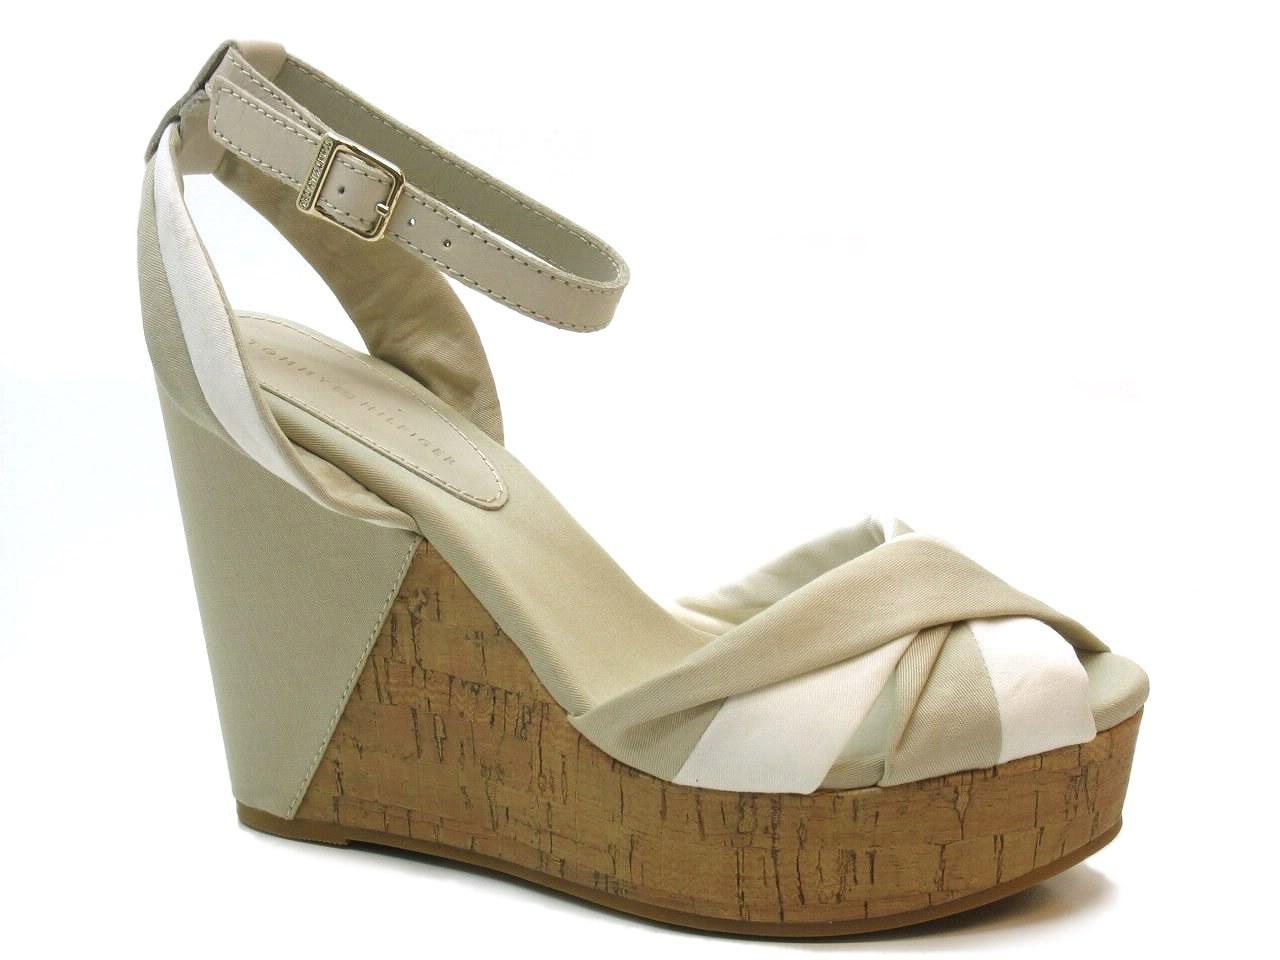 Sandálias de Cunha Tommy Hilfiger - 309 16774